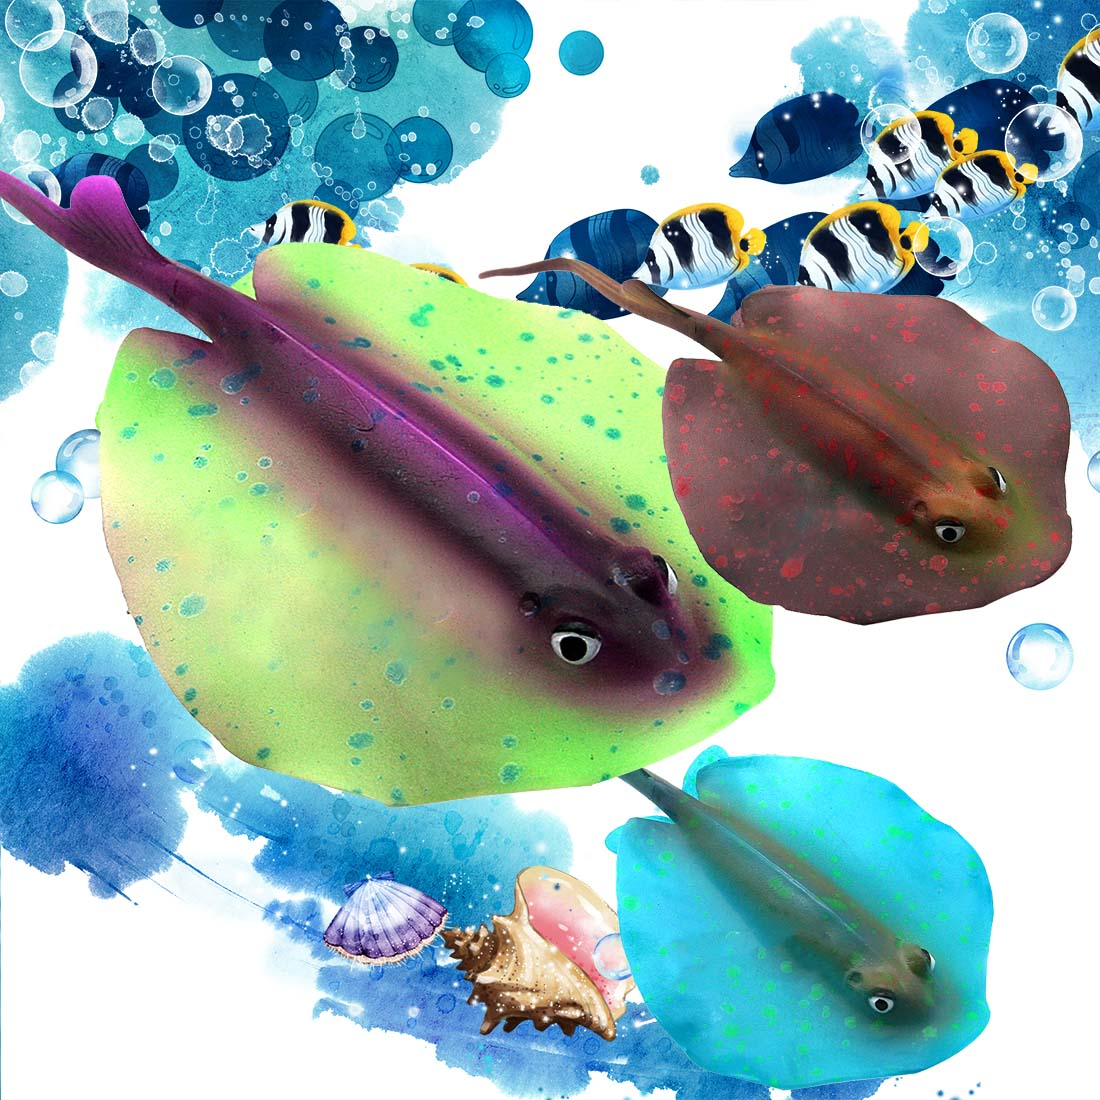 Fish aquarium online buy - New 6 Colors Of Green Microscopic Simulation Of Plastic Luminous Devil Fish Aquarium Products Simulation Of